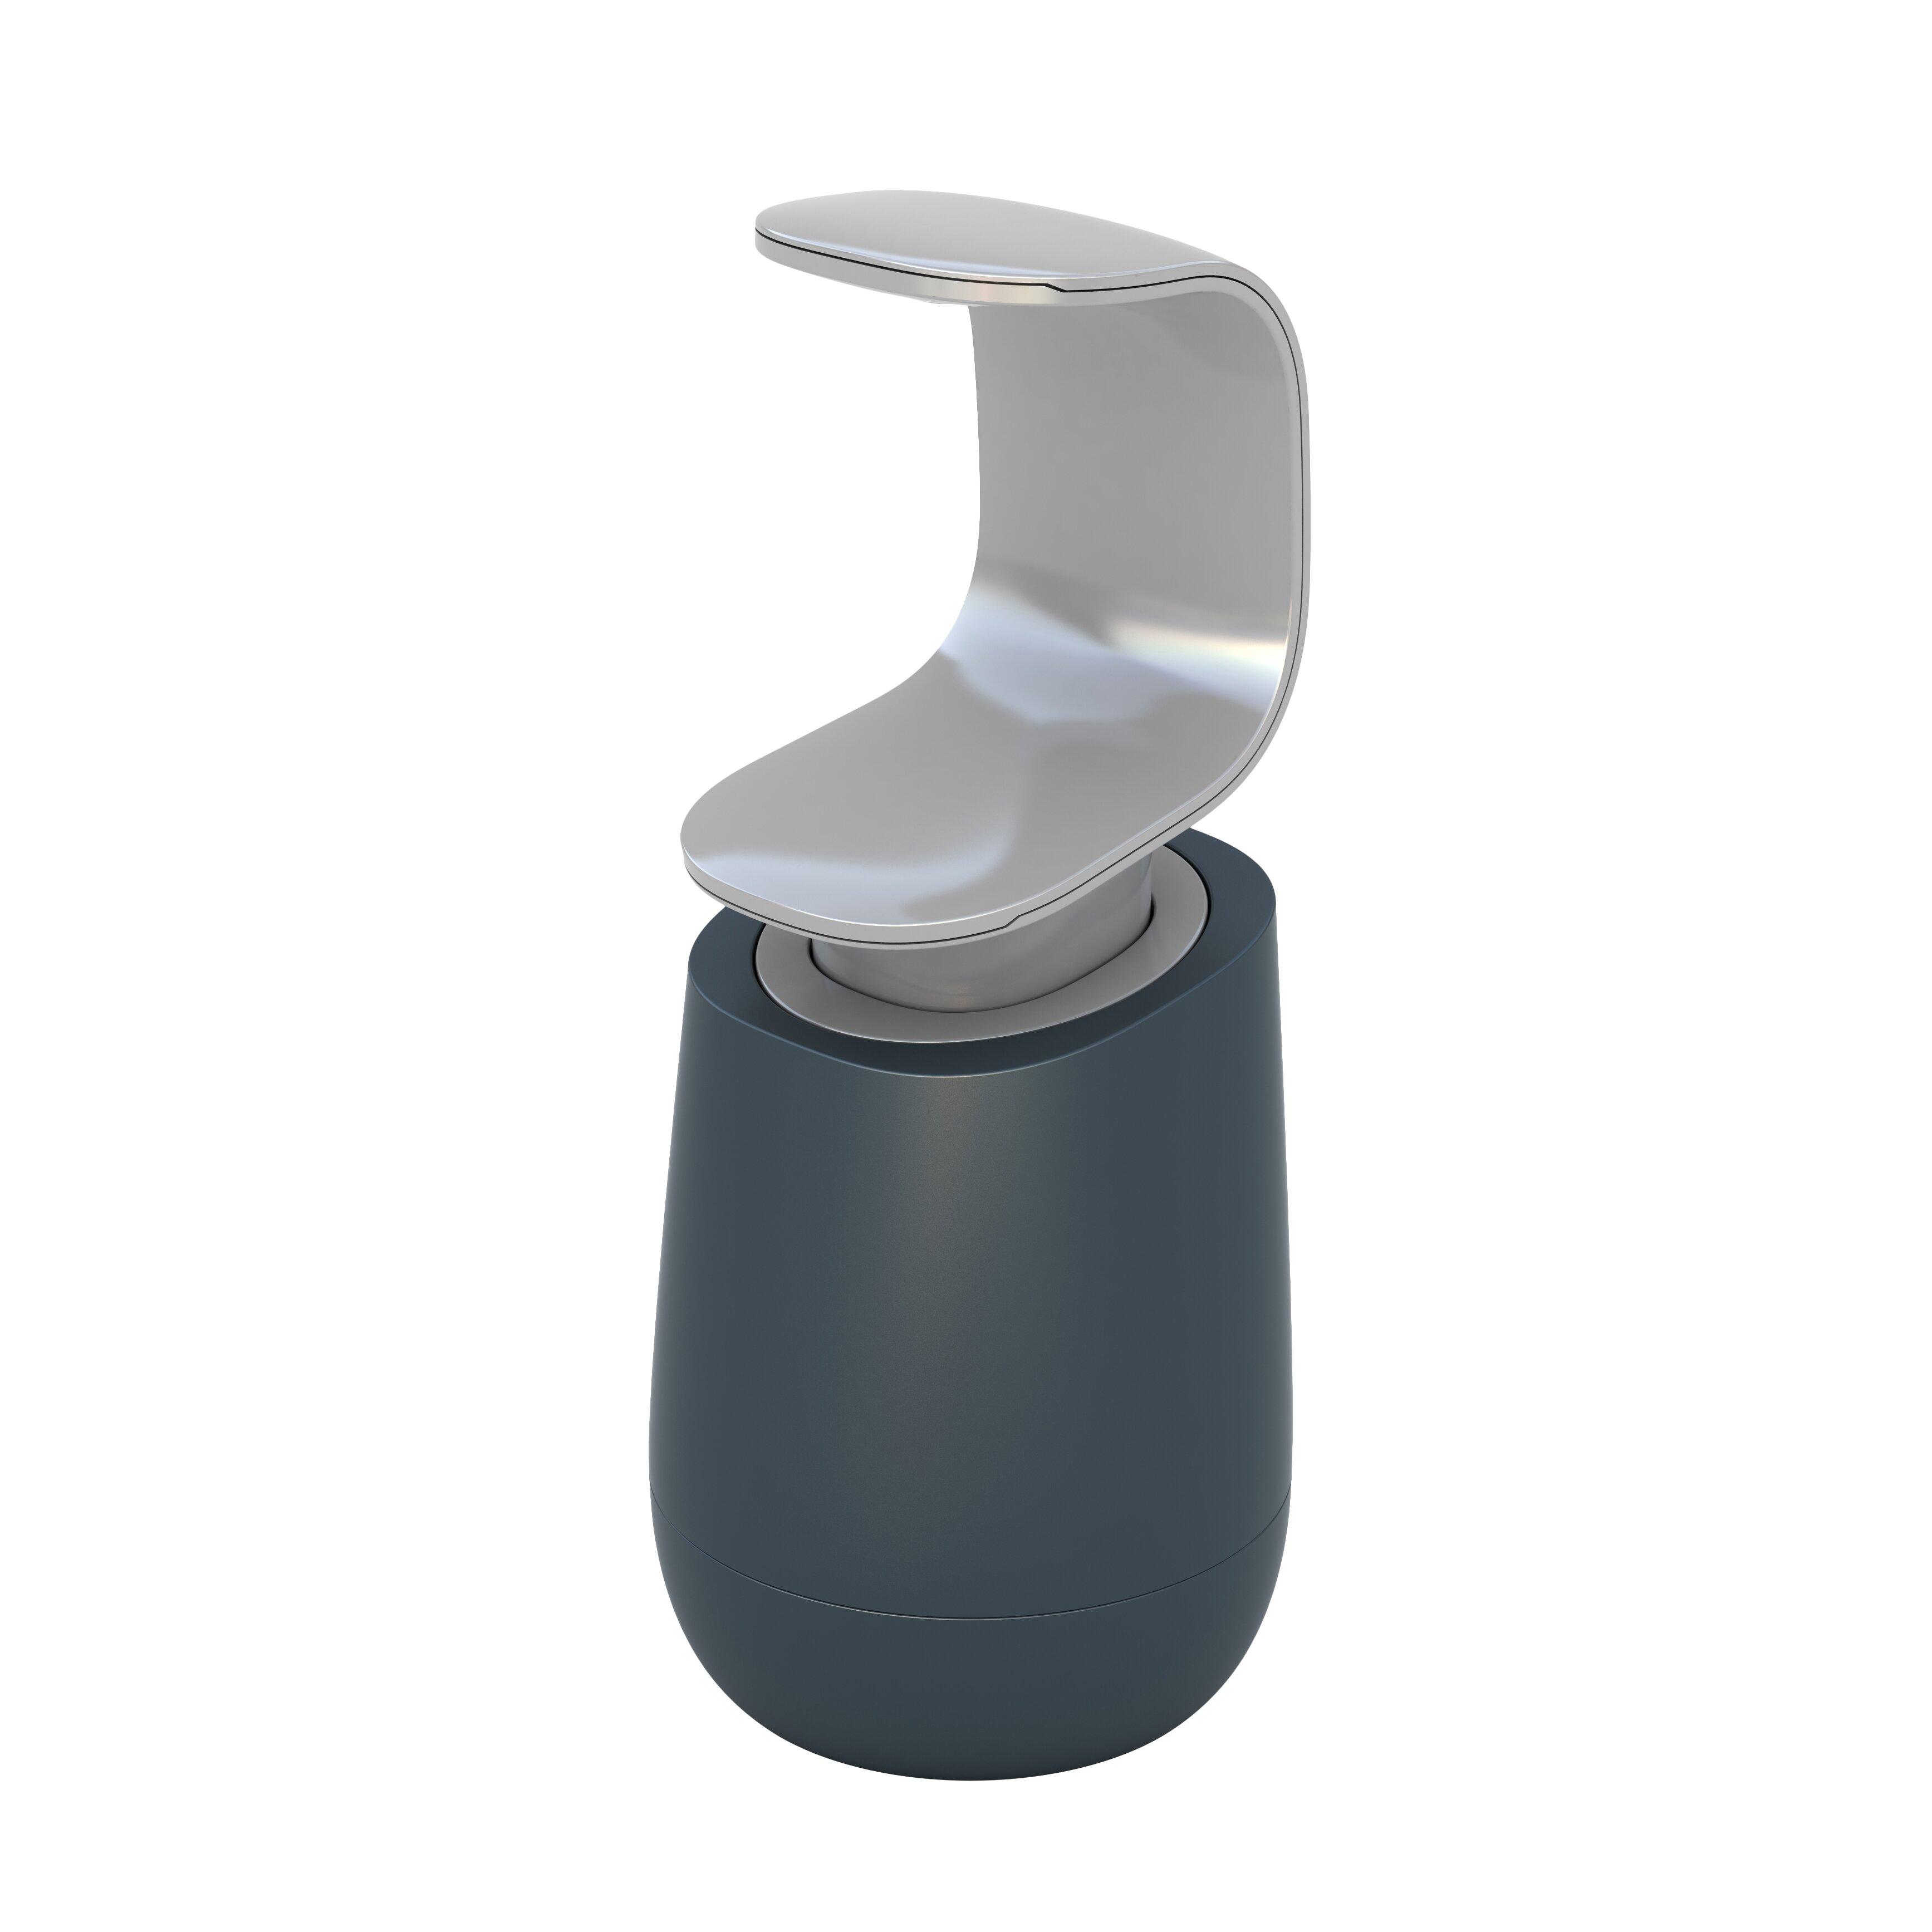 joseph joseph c-pump soap dispenser & reviews | wayfair